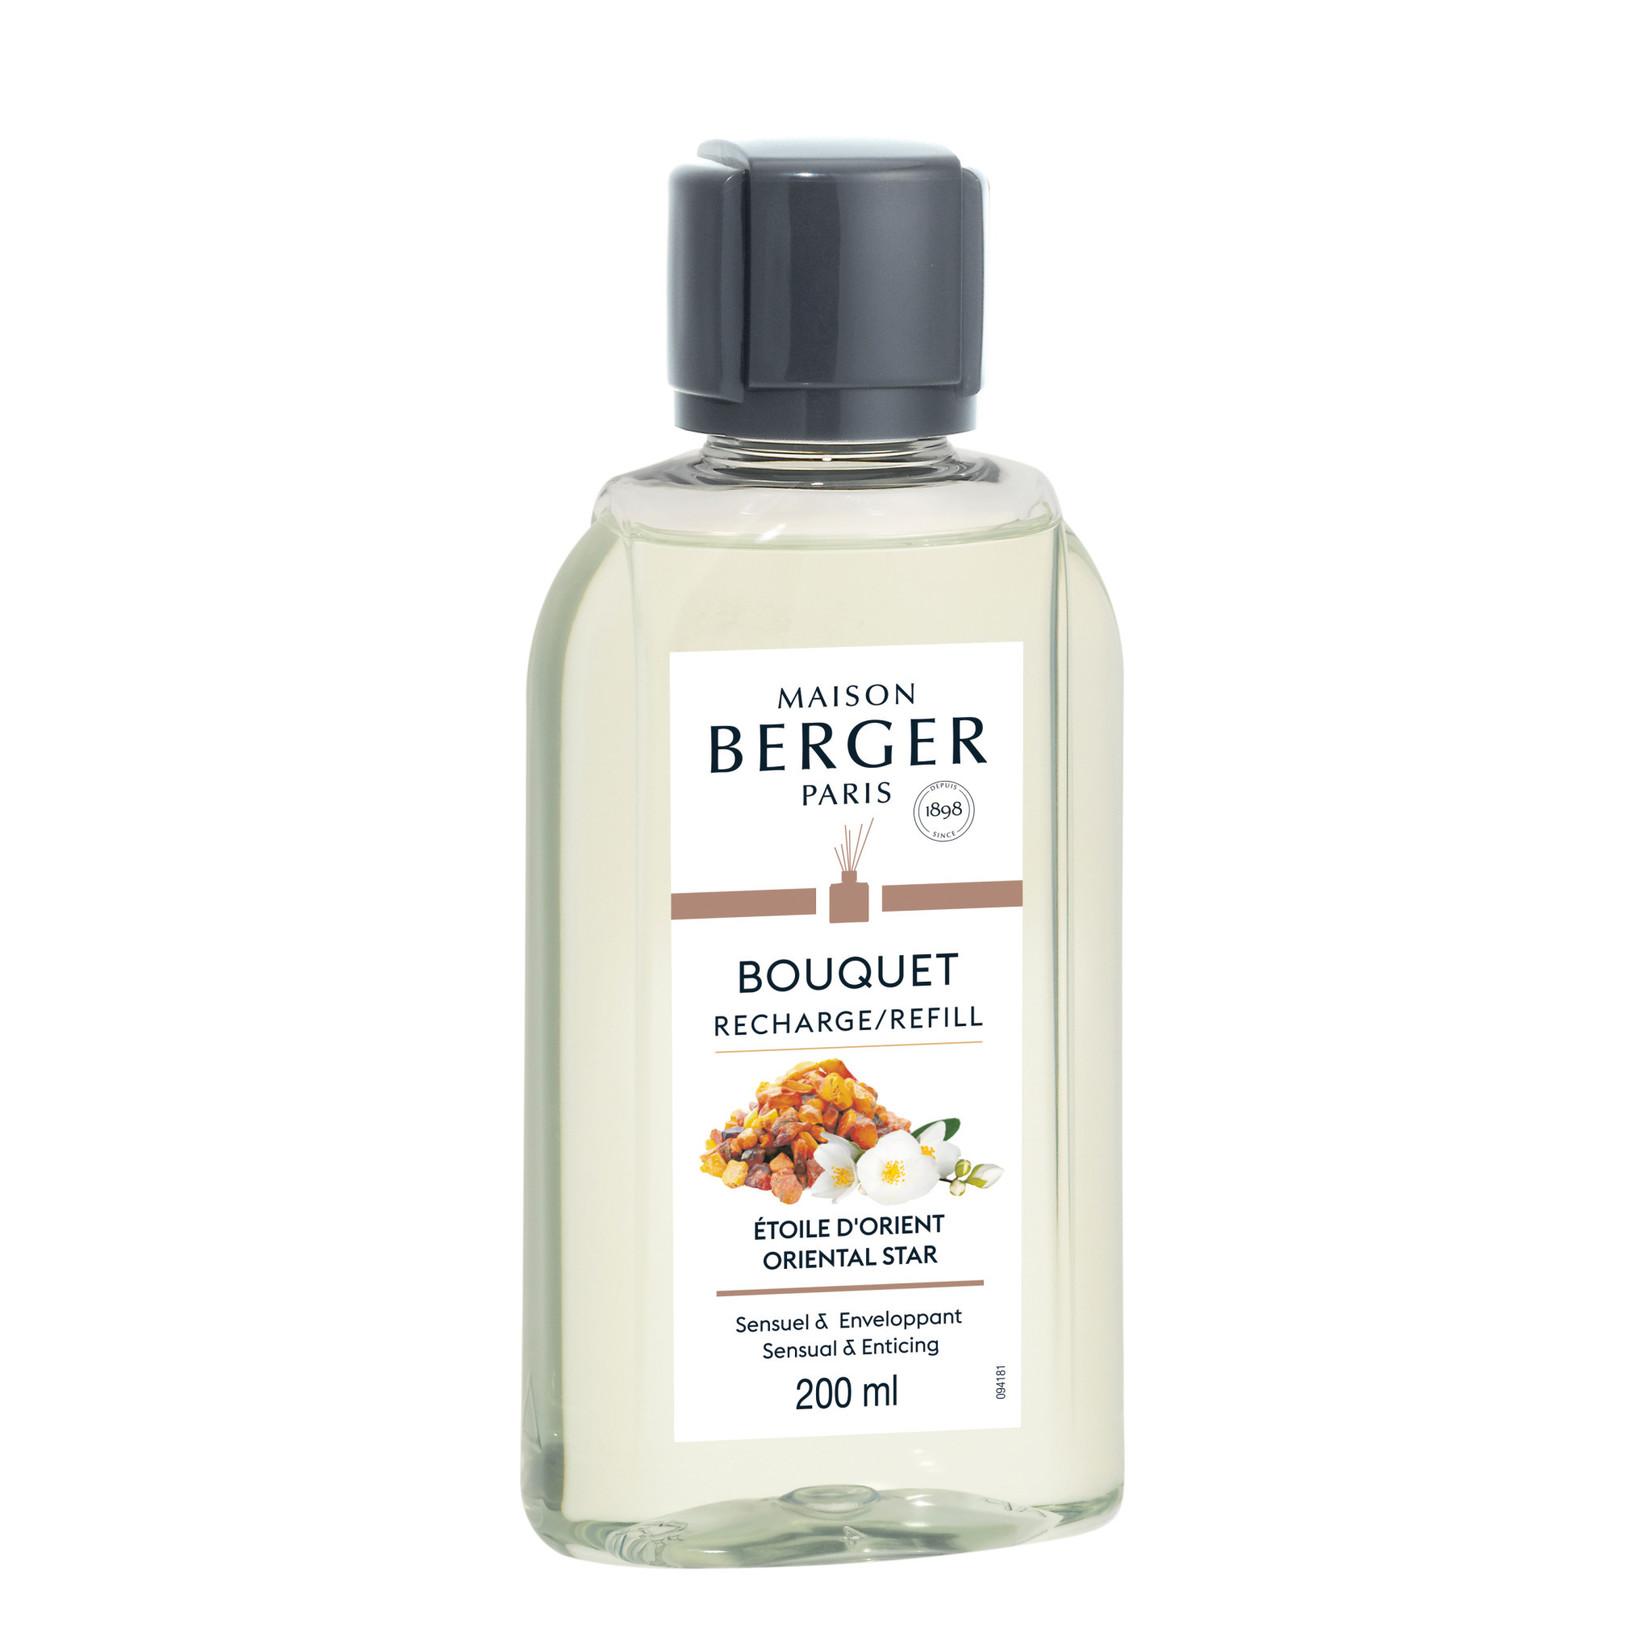 Lampe Berger Navulling parfumverspreider 200ml Etoile d'Orient